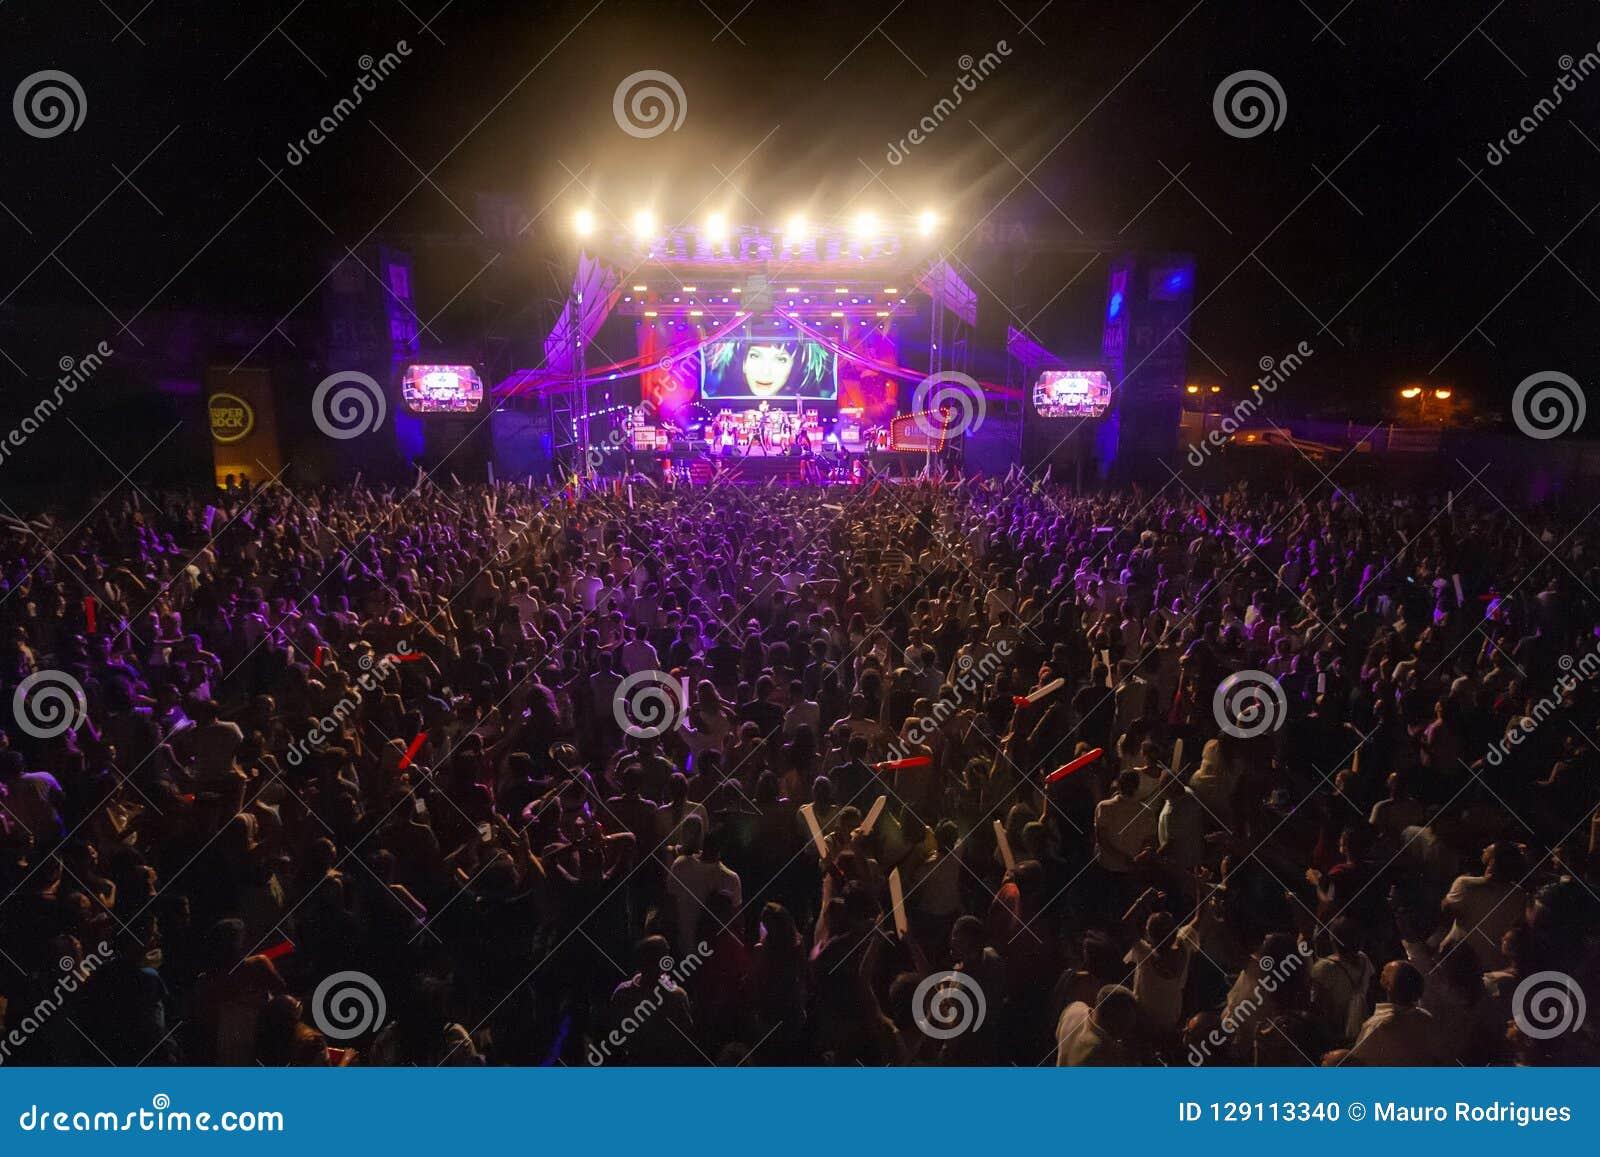 Revenge of the 90s band performing on Music Festival